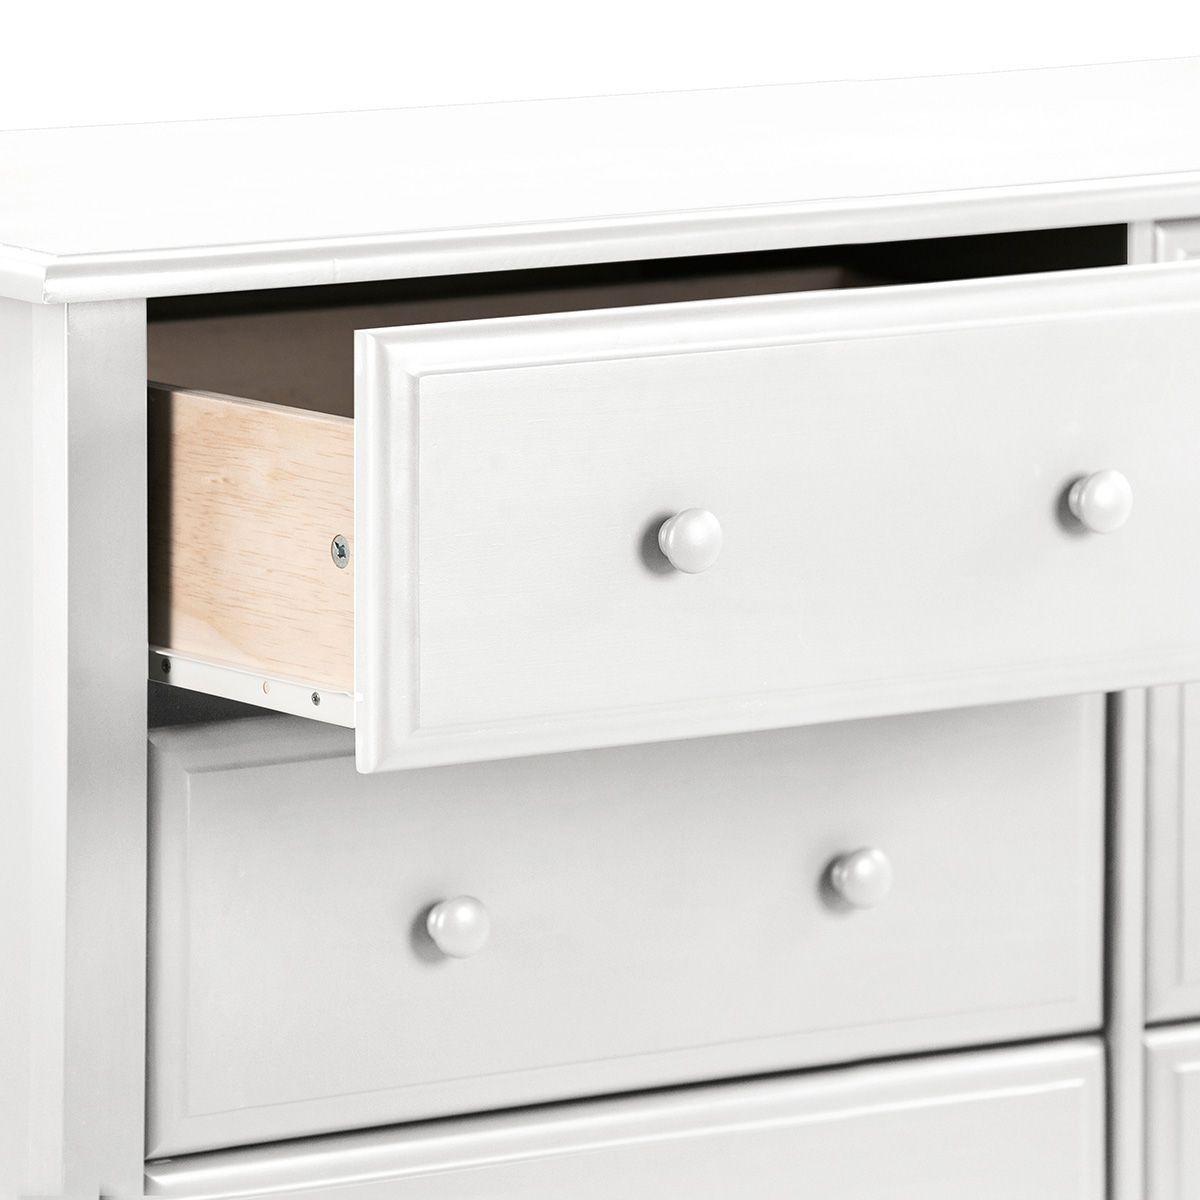 Evolur Waverly Double Dresser Rustic Grey Double Dresser Wide Dresser Drawers [ 1200 x 1200 Pixel ]